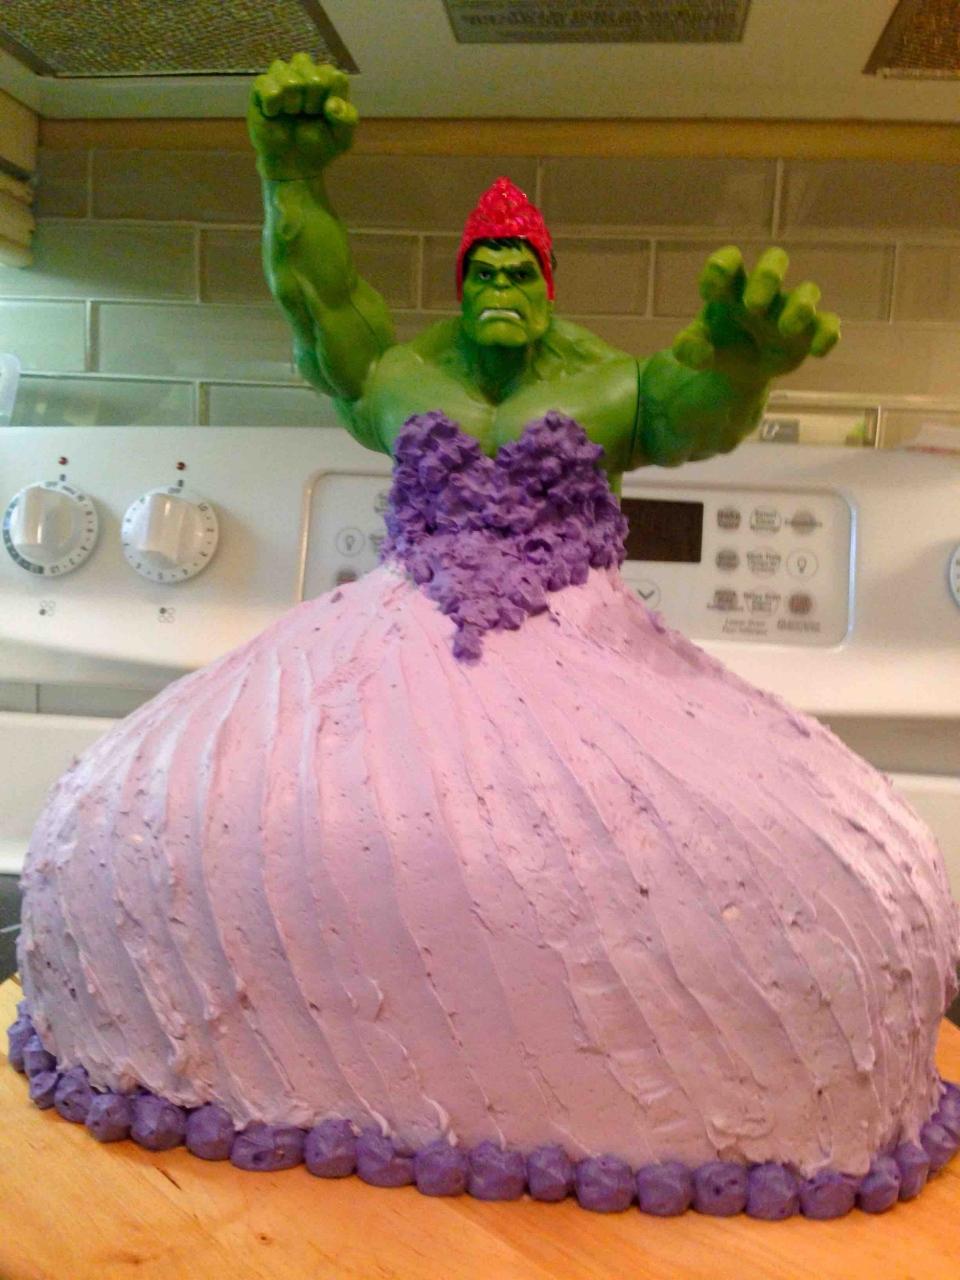 Twin Girls Get Princess Hulk Birthday Cake September 17th